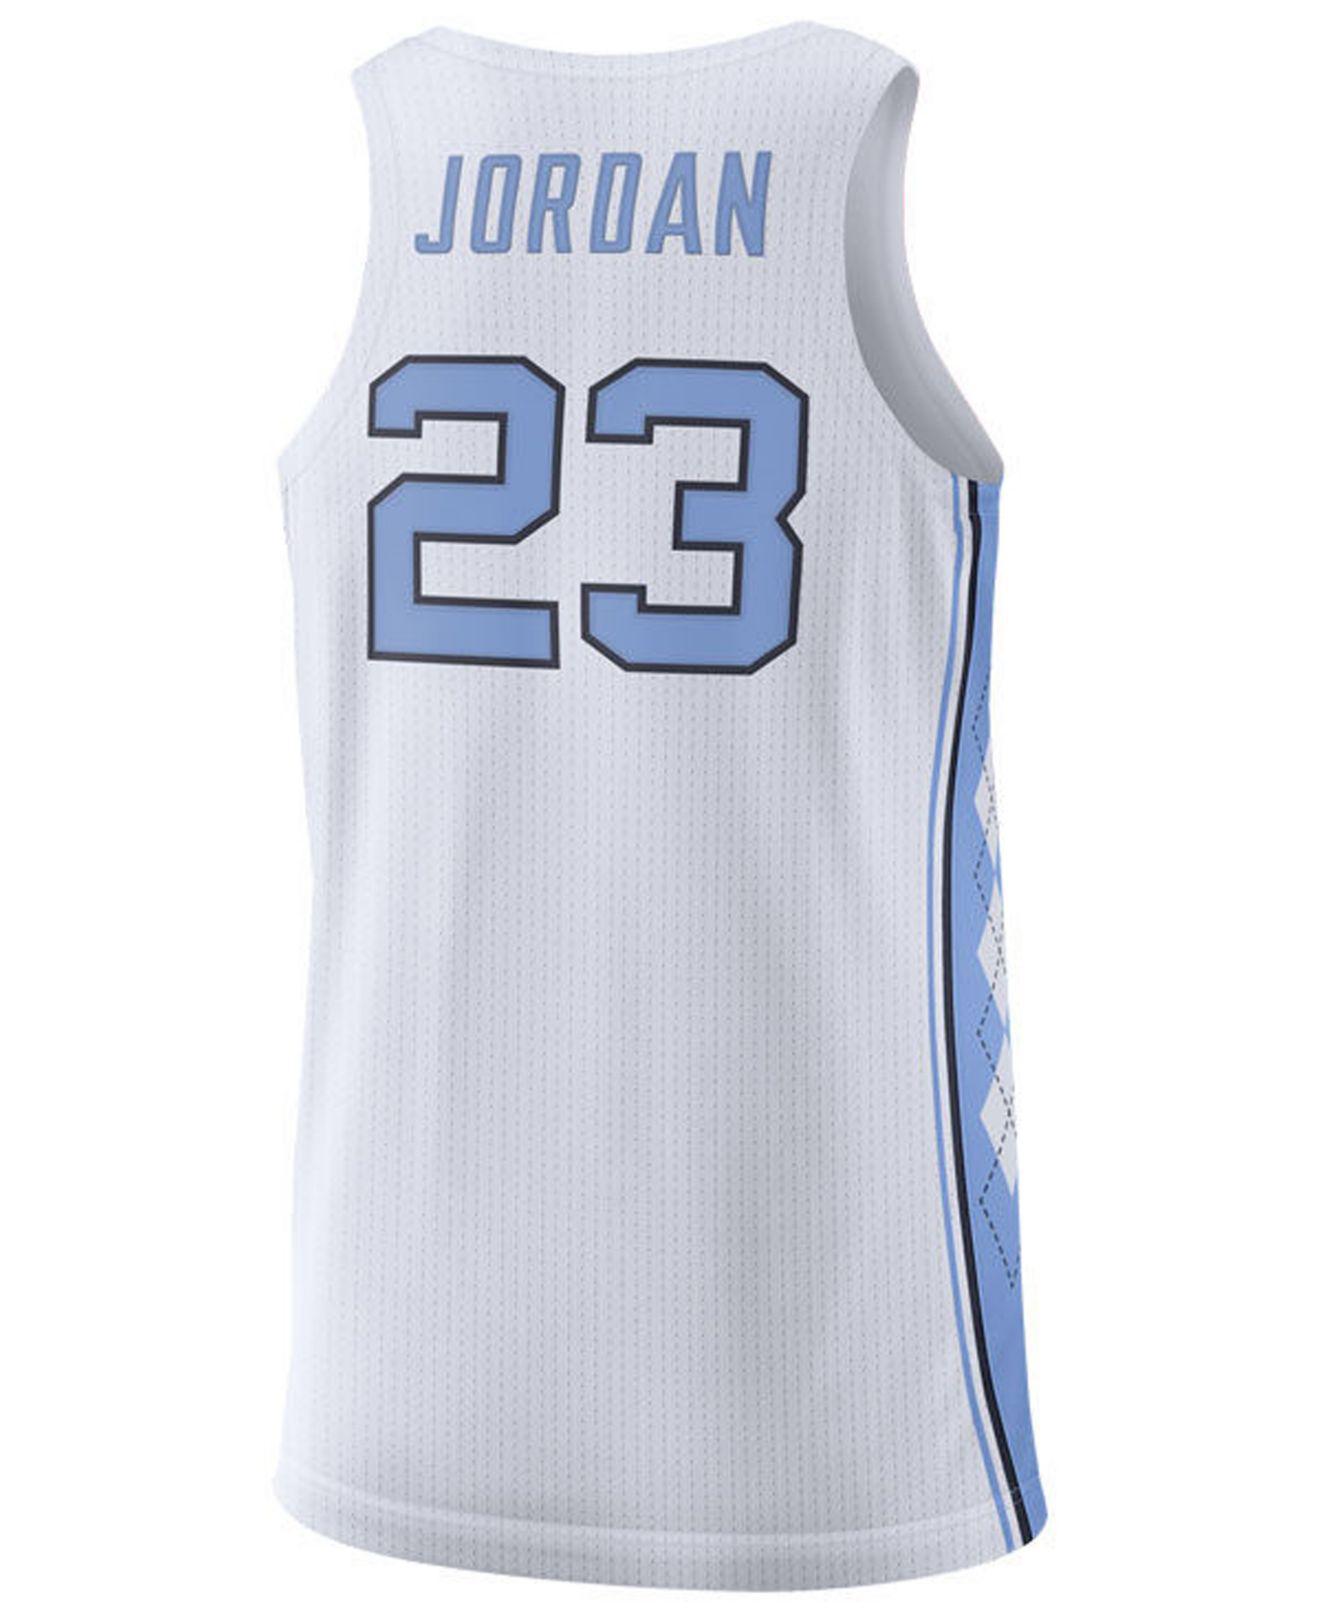 bd68cf93533 Lyst - Nike Michael Jordan North Carolina Tar Heels Authentic Basketball  Jersey in White for Men